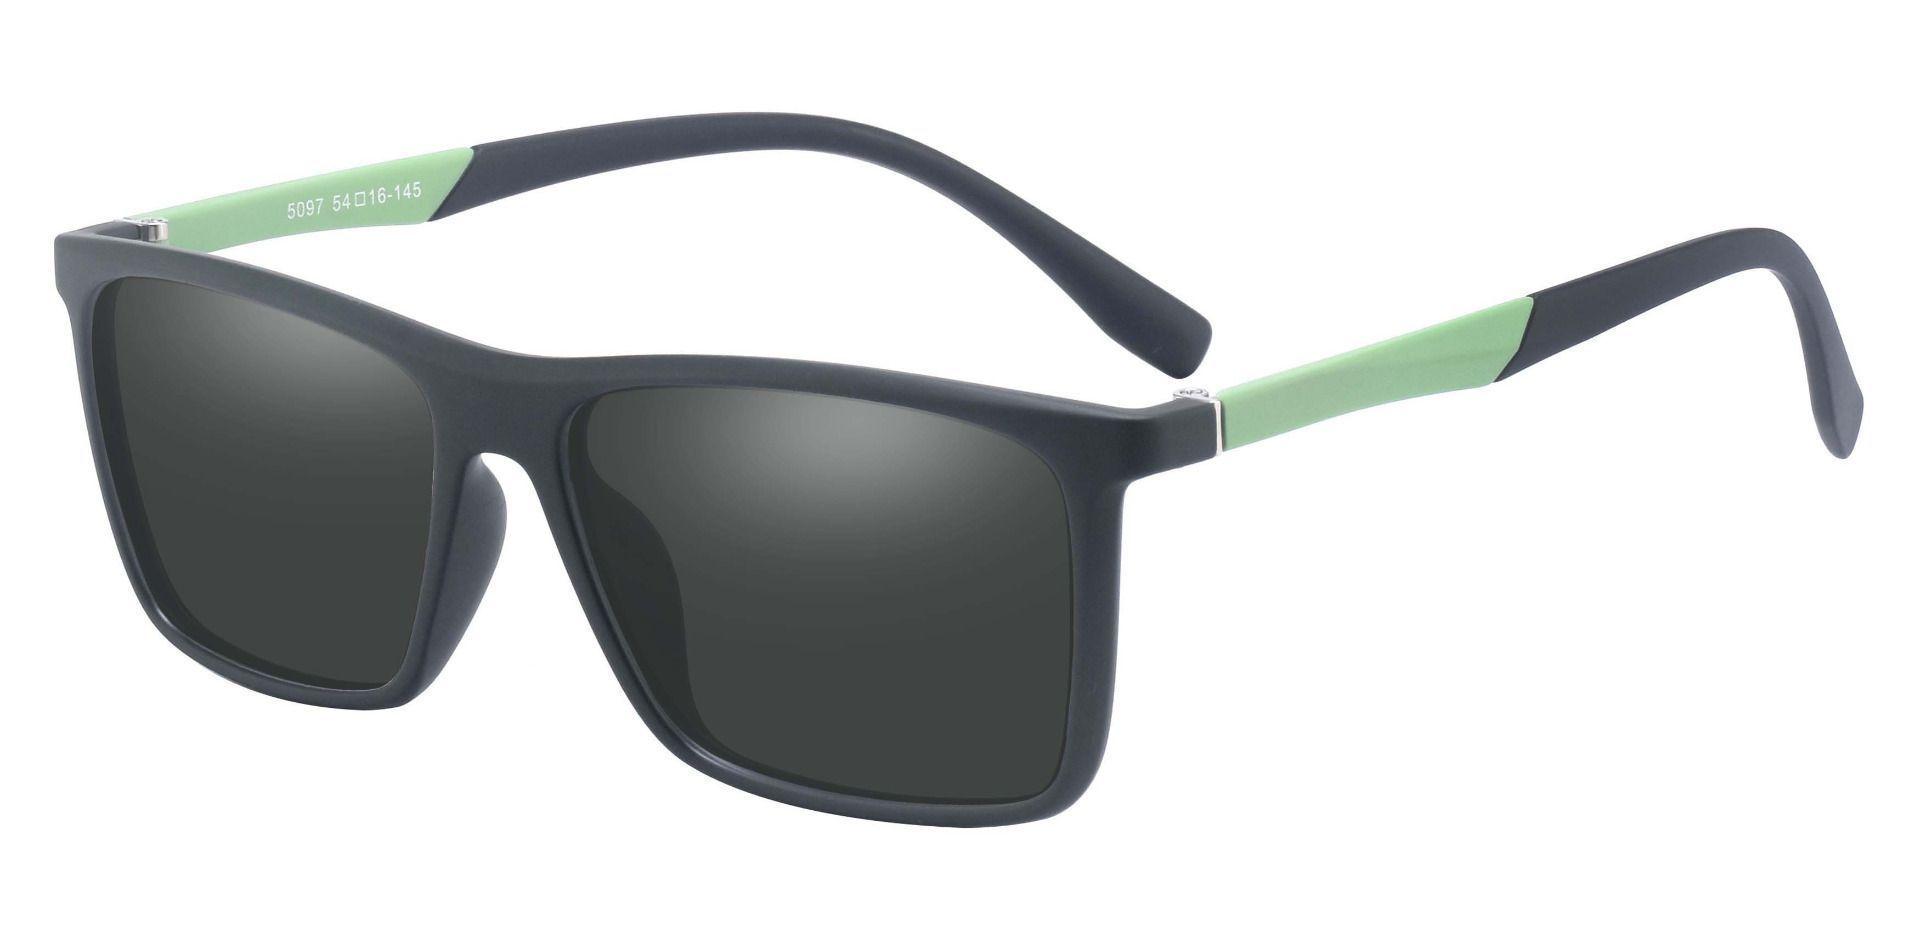 Cleveland Rectangle Prescription Sunglasses - Green Frame With Gray Lenses